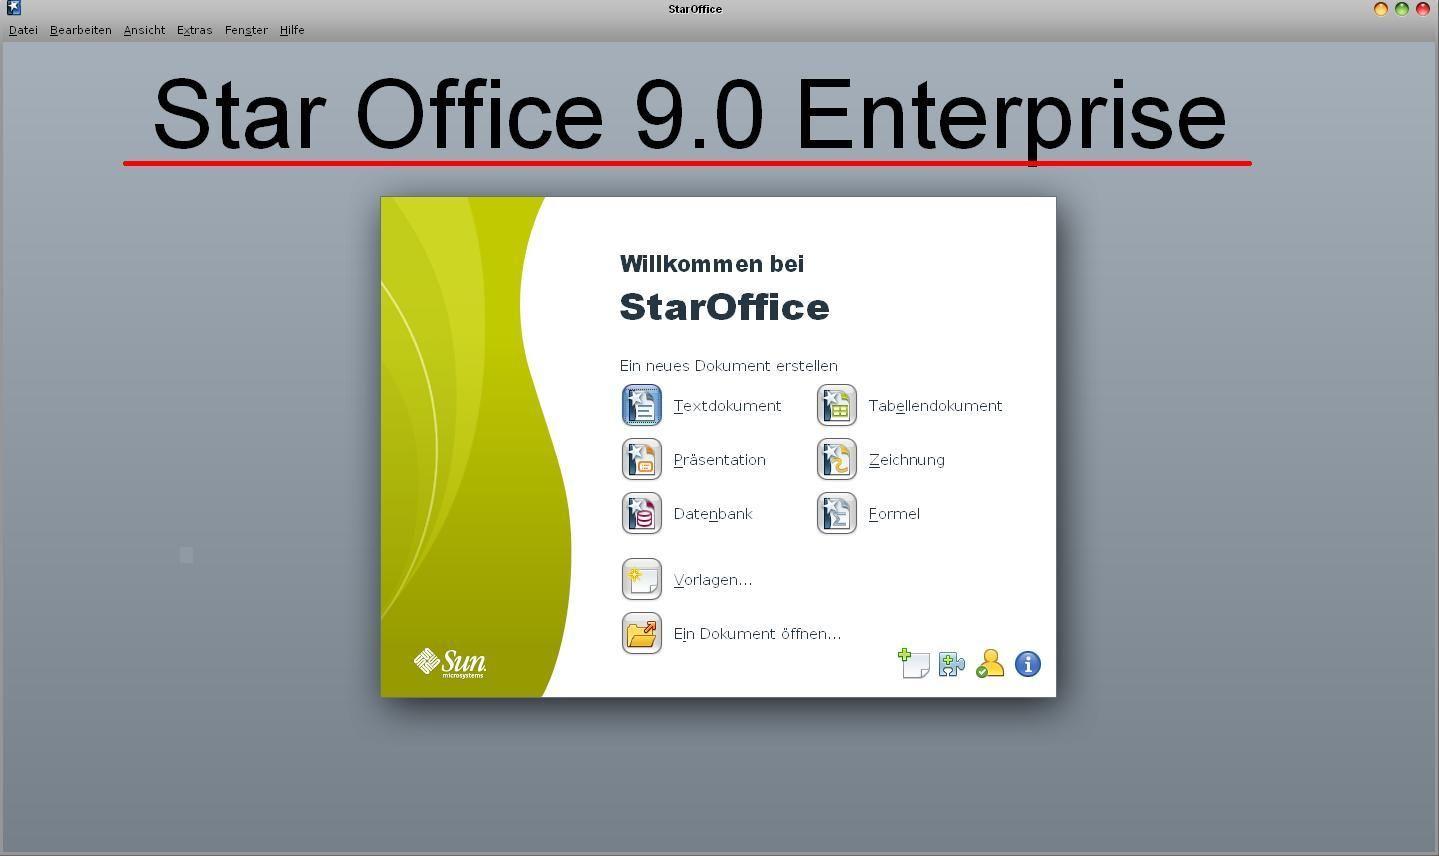 staroffice standard 9.0